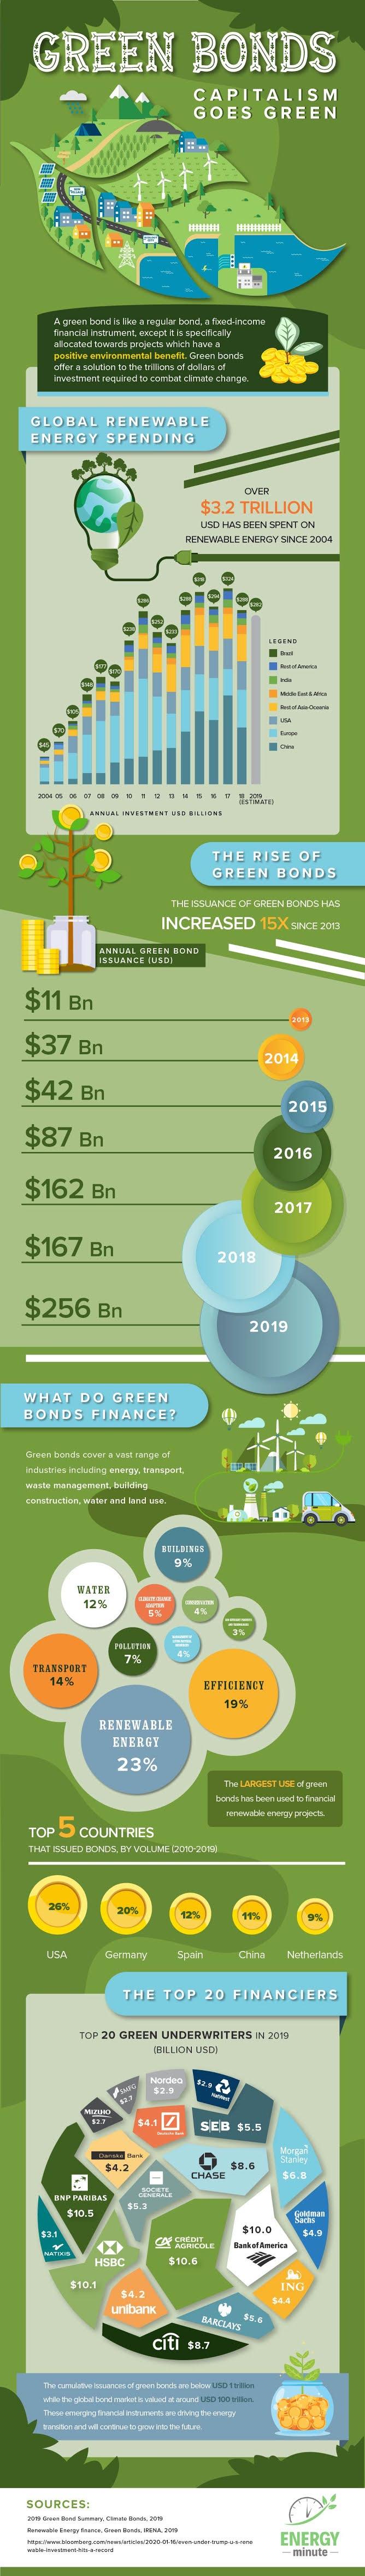 Green Bonds: Capitalism Goes Green #infographic